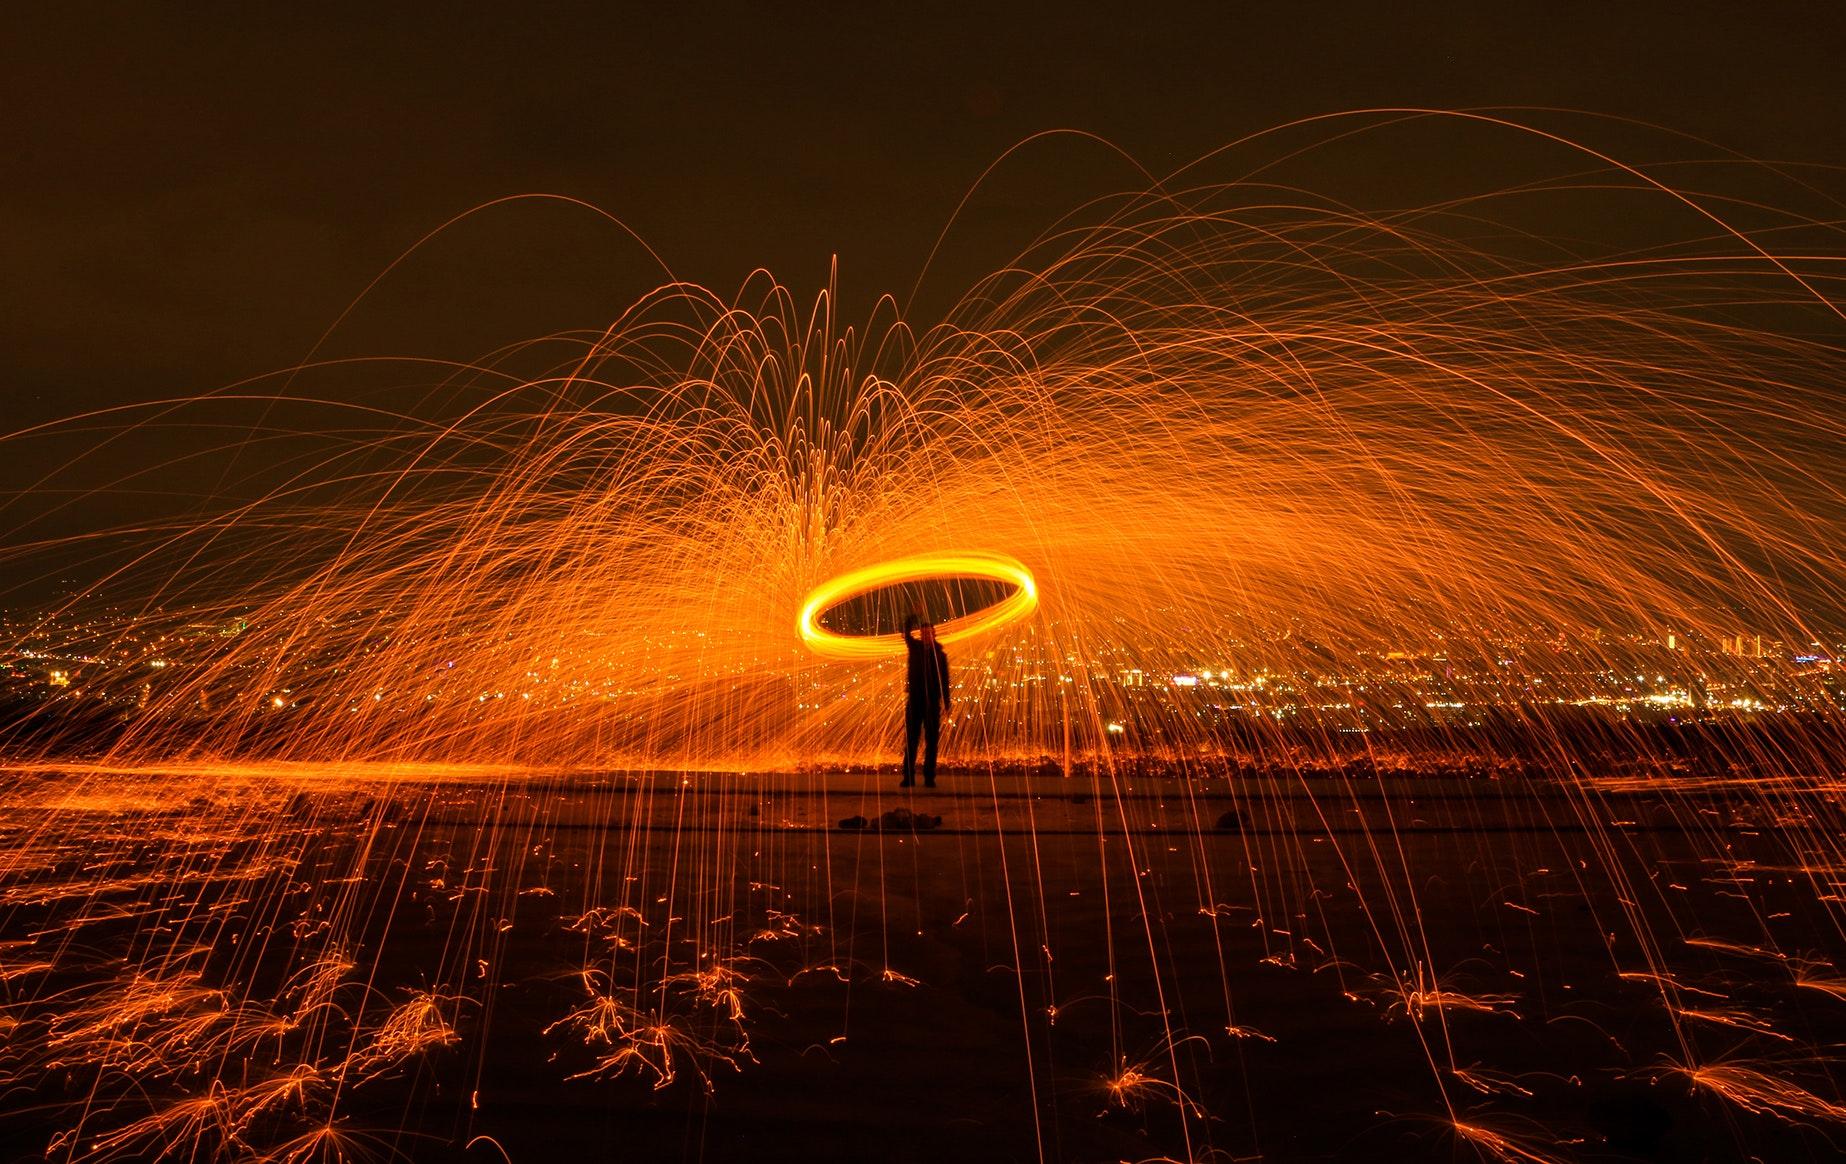 Fireworks Photography, Sparkle, Steelwool, Sparkler, Man, HQ Photo